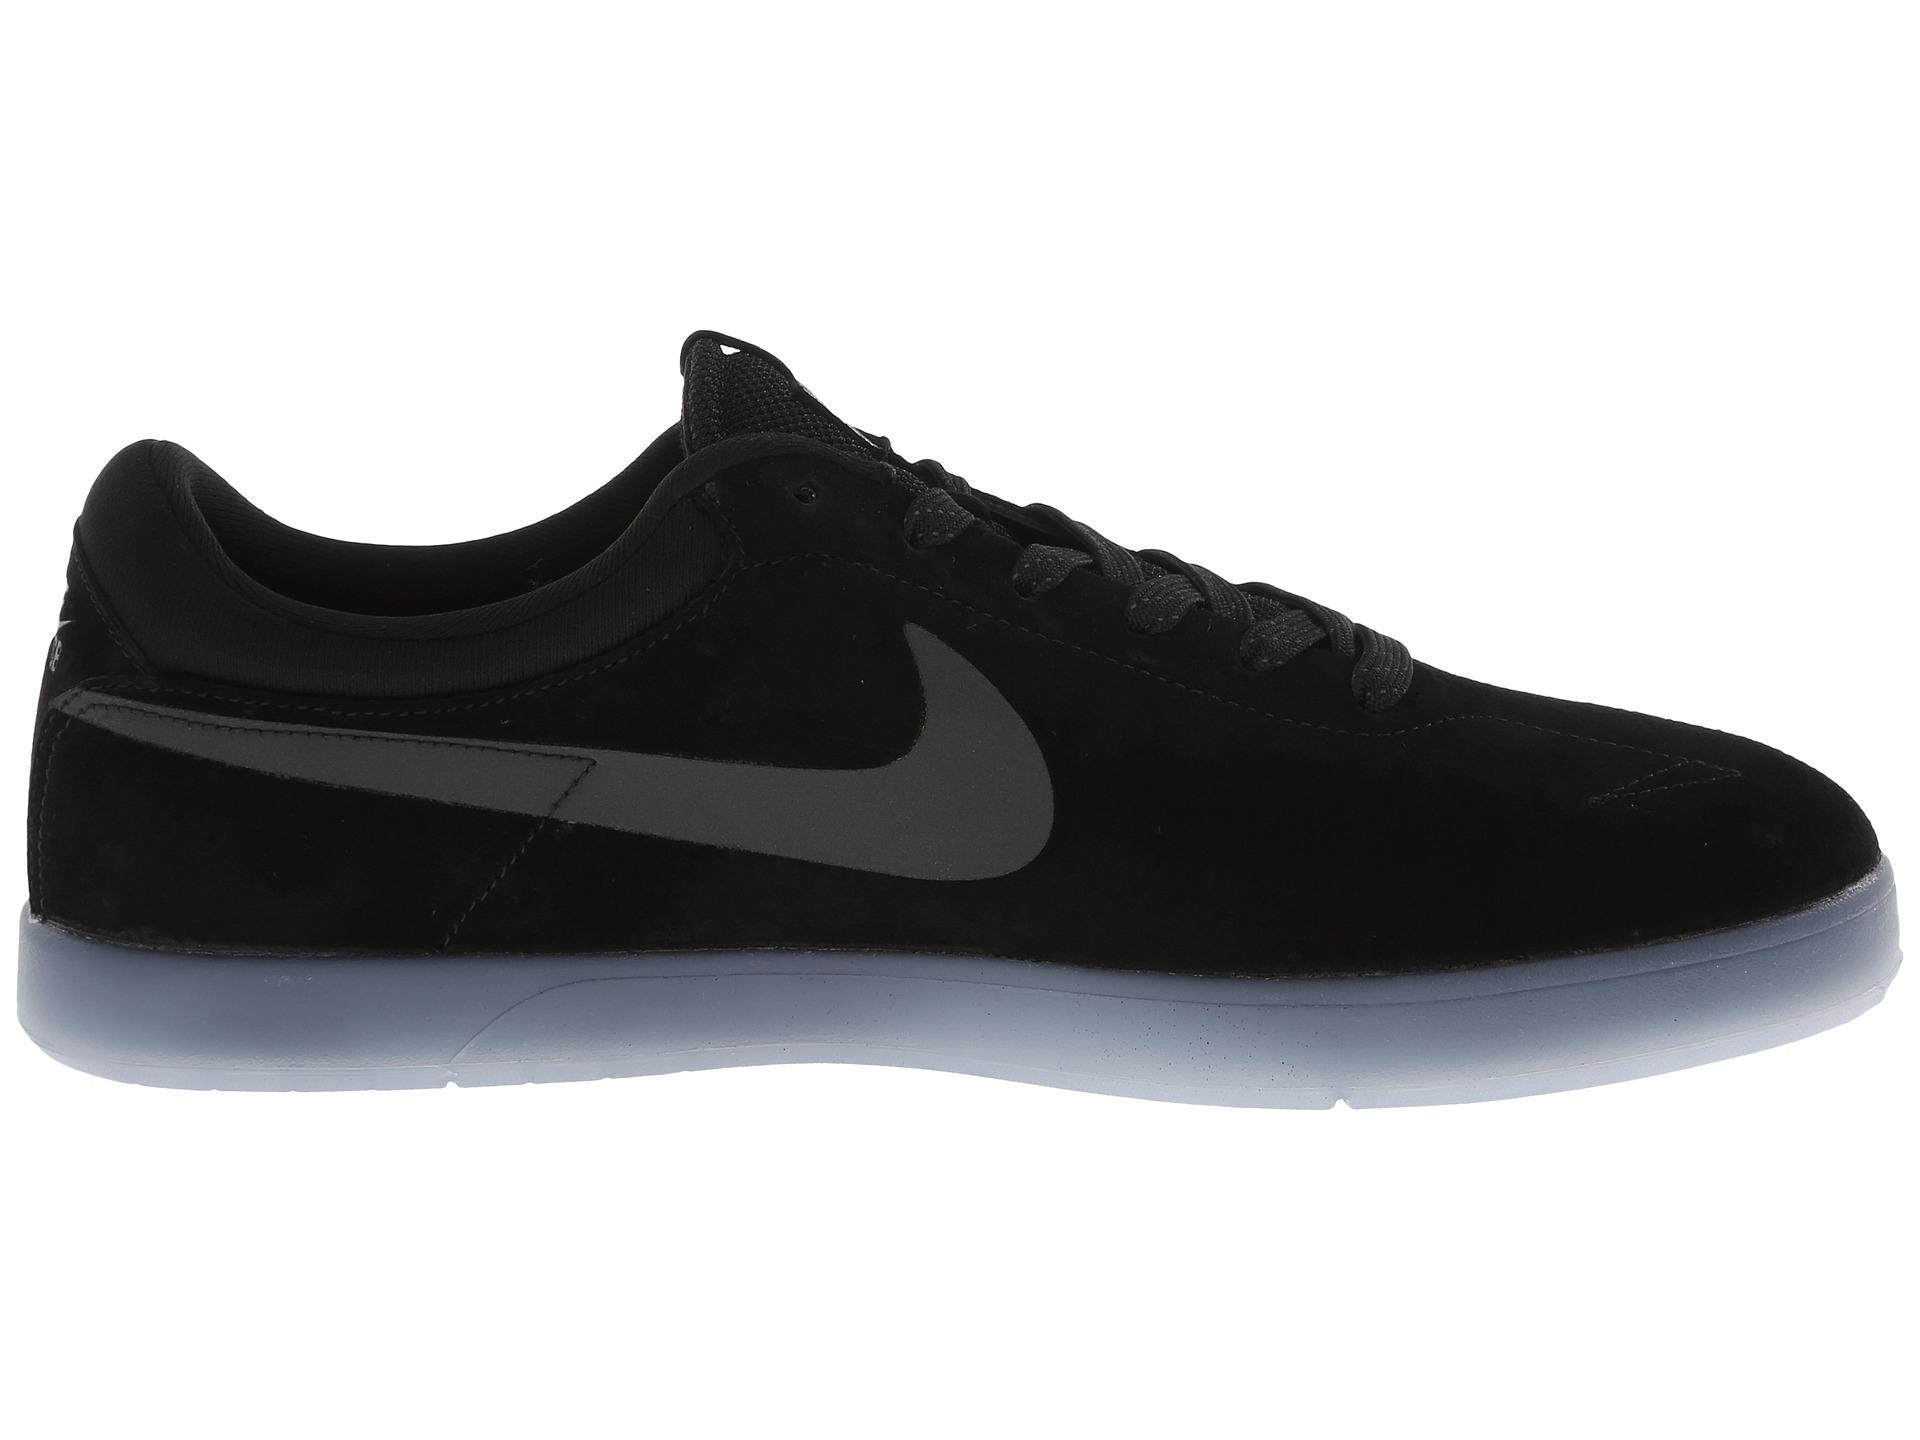 d17e72d99ec Lyst - Nike Zoom Eric Koston Flash in Black for Men